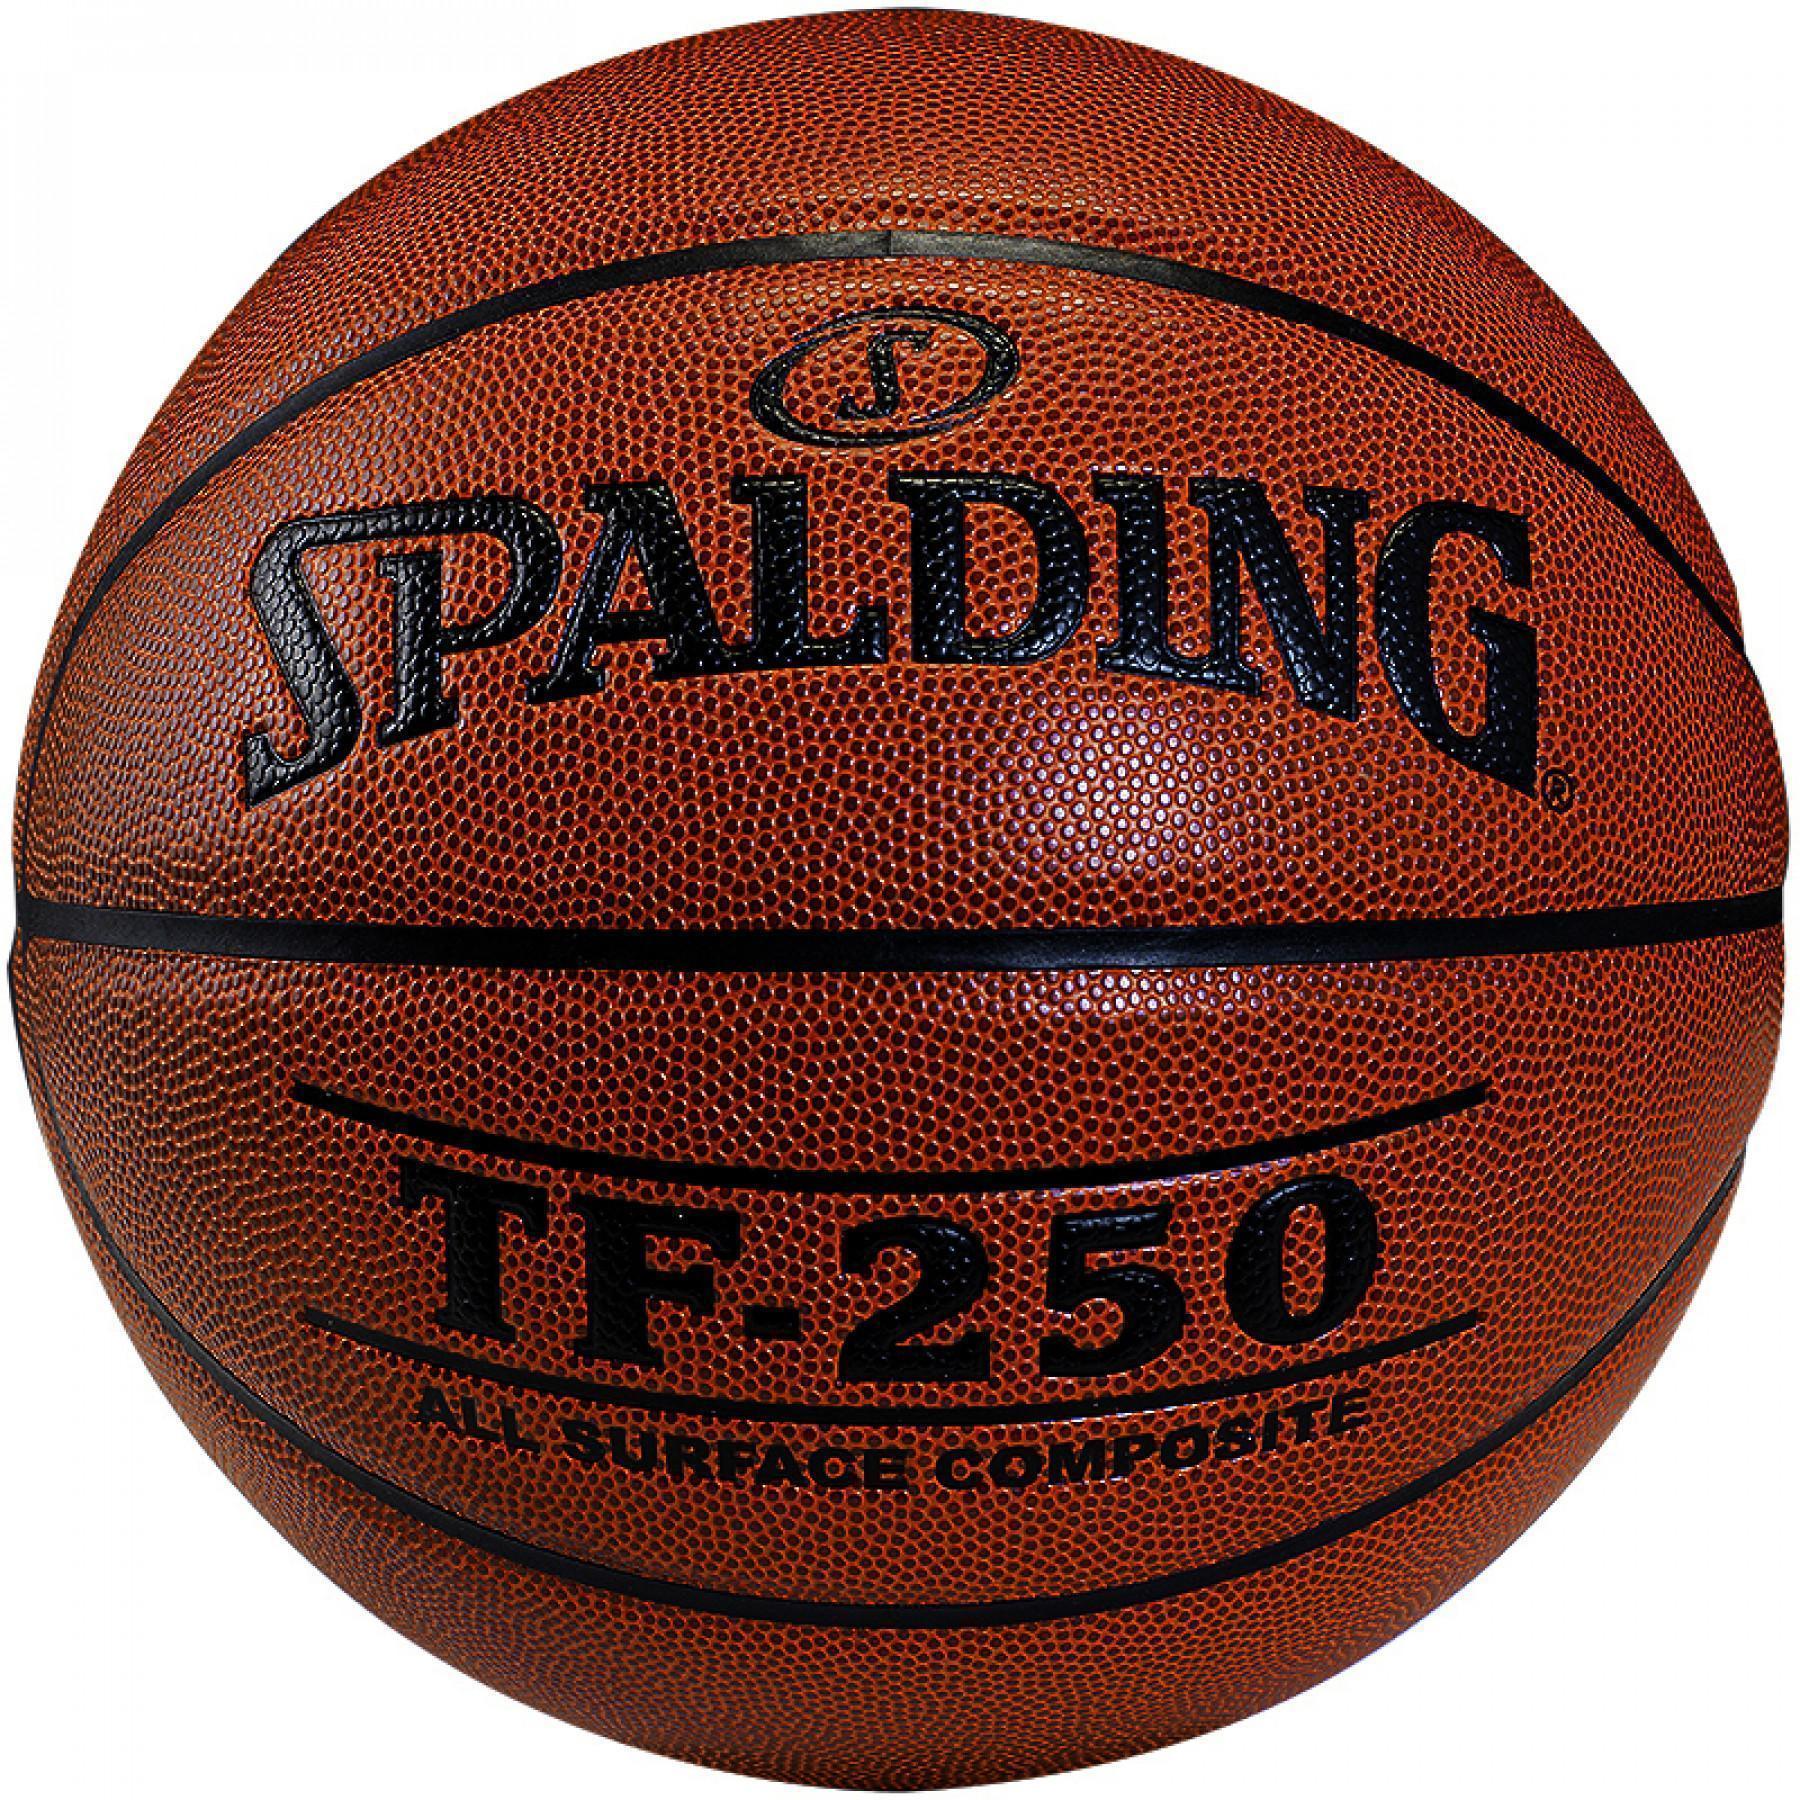 Balloon Spalding TF250 indoor/outdoor